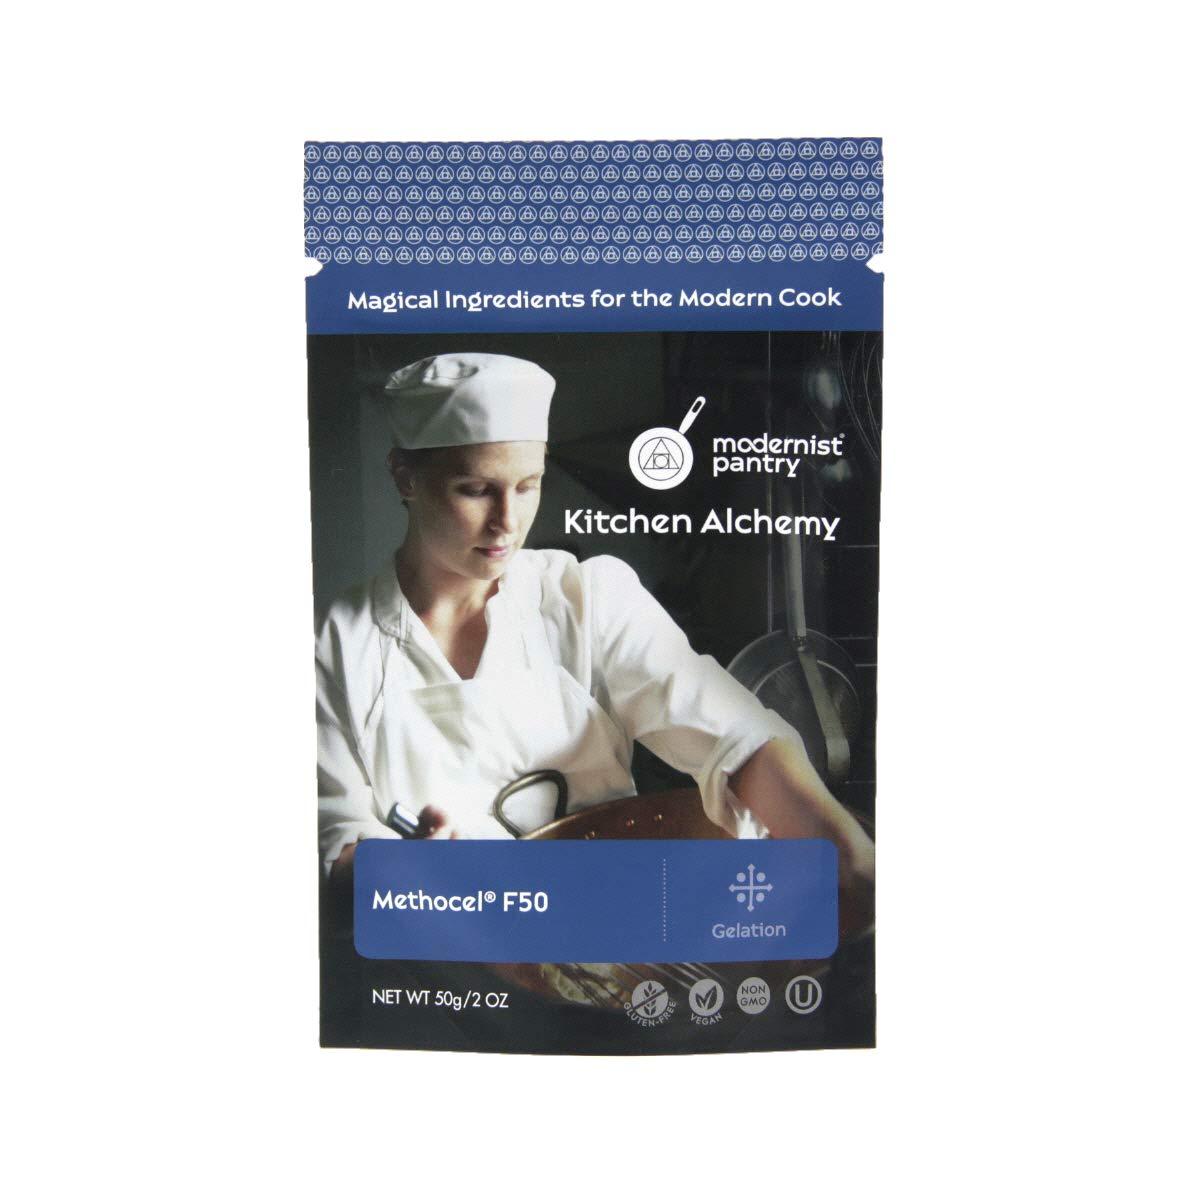 Hydroxypropyl Methylcellulose - Methocel F50 ⊘ Non-GMO ☮ Vegan ✡ OU Kosher Certified - 50g/2oz